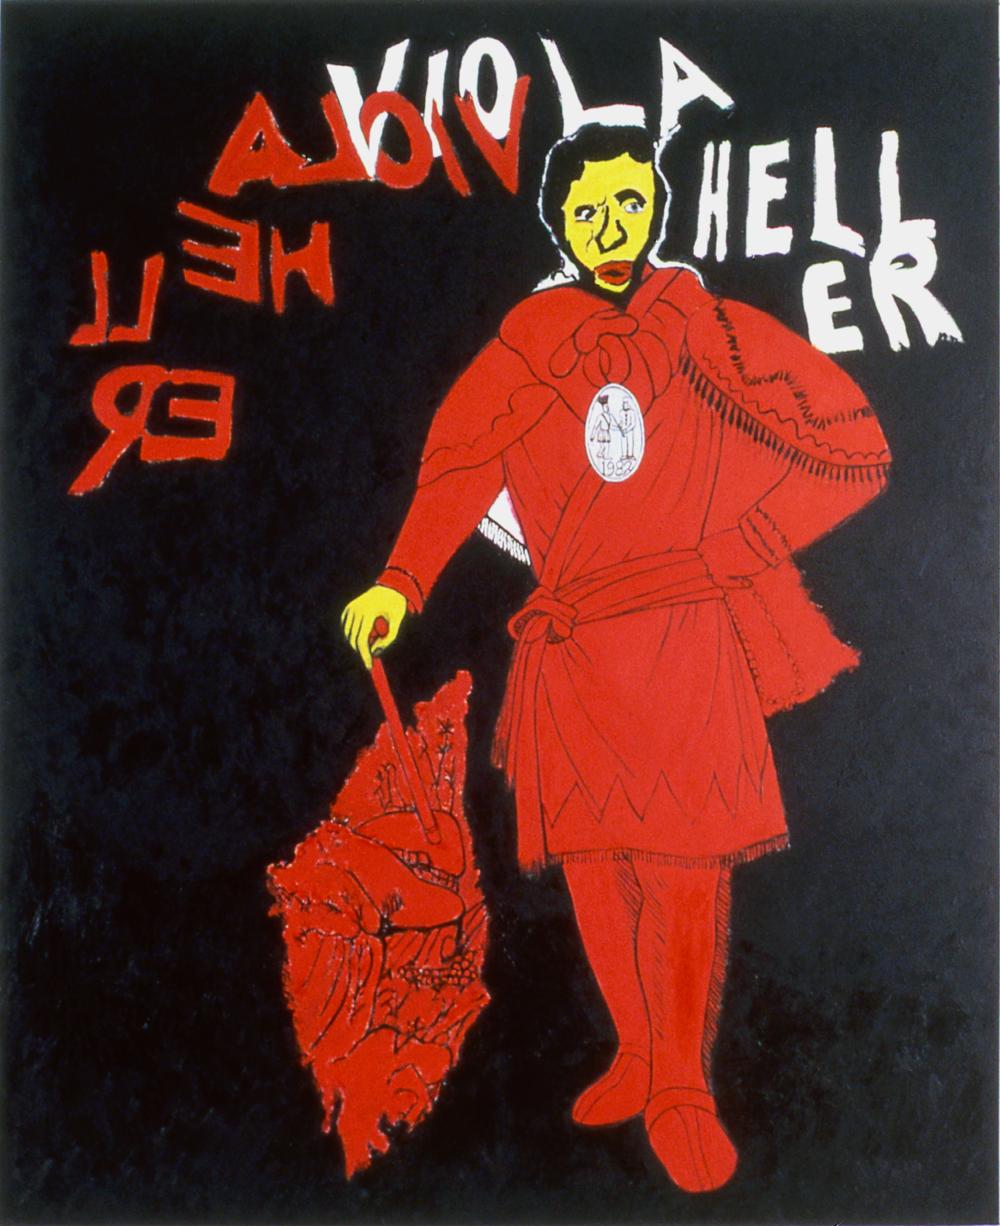 Viola Heller's Red Jacket